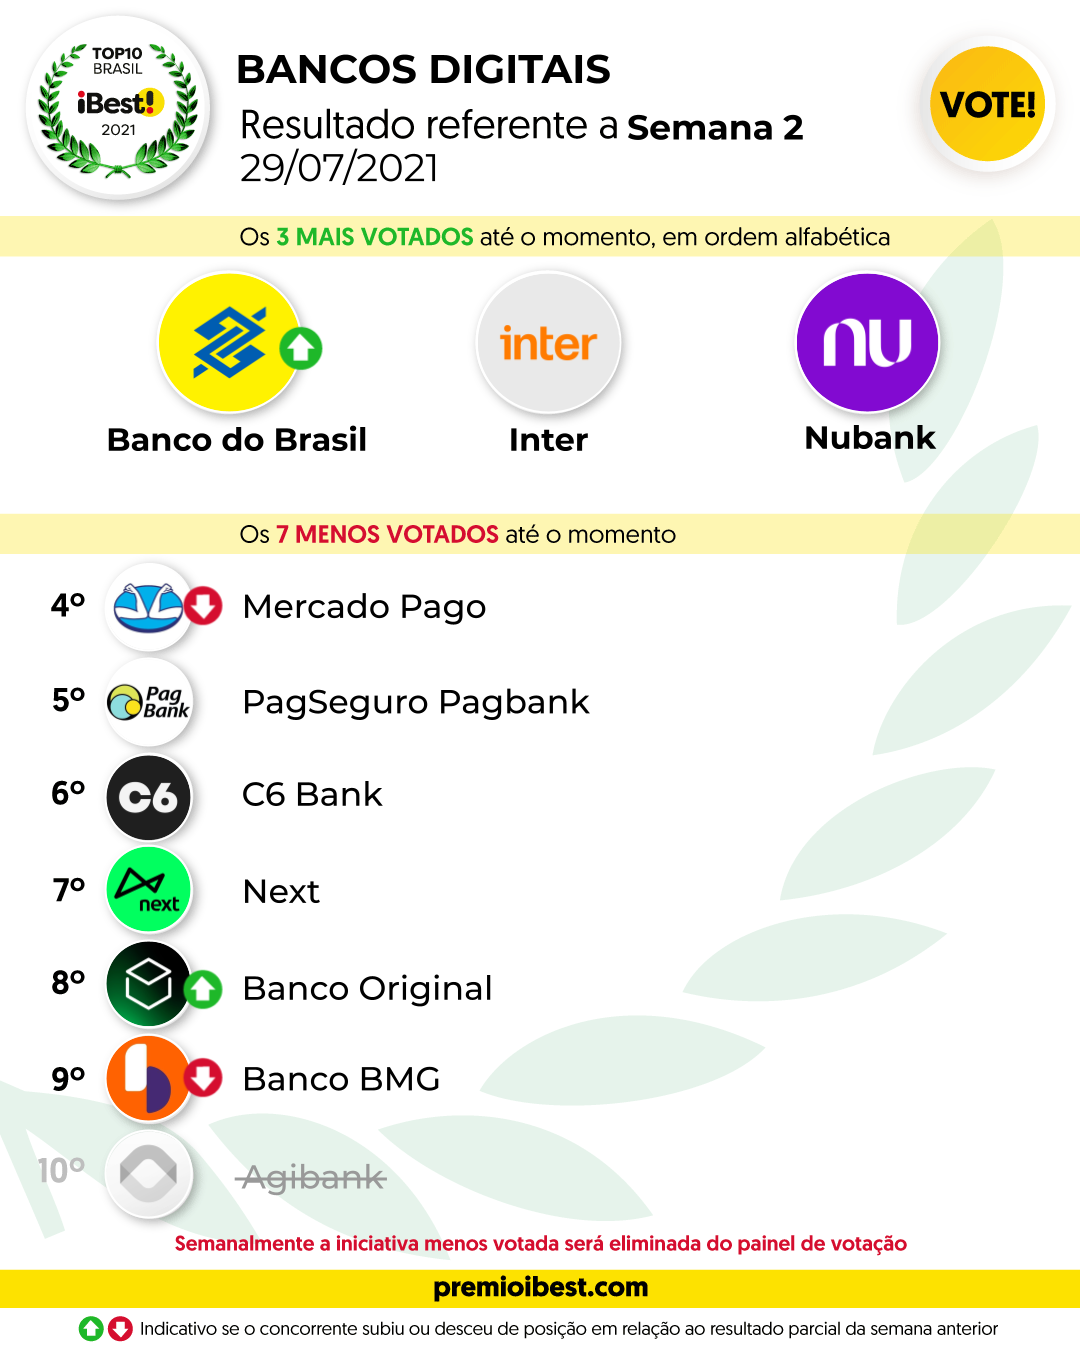 qui-feira SEMA 2 BASE _ Parciais top10 2021_feed (11)